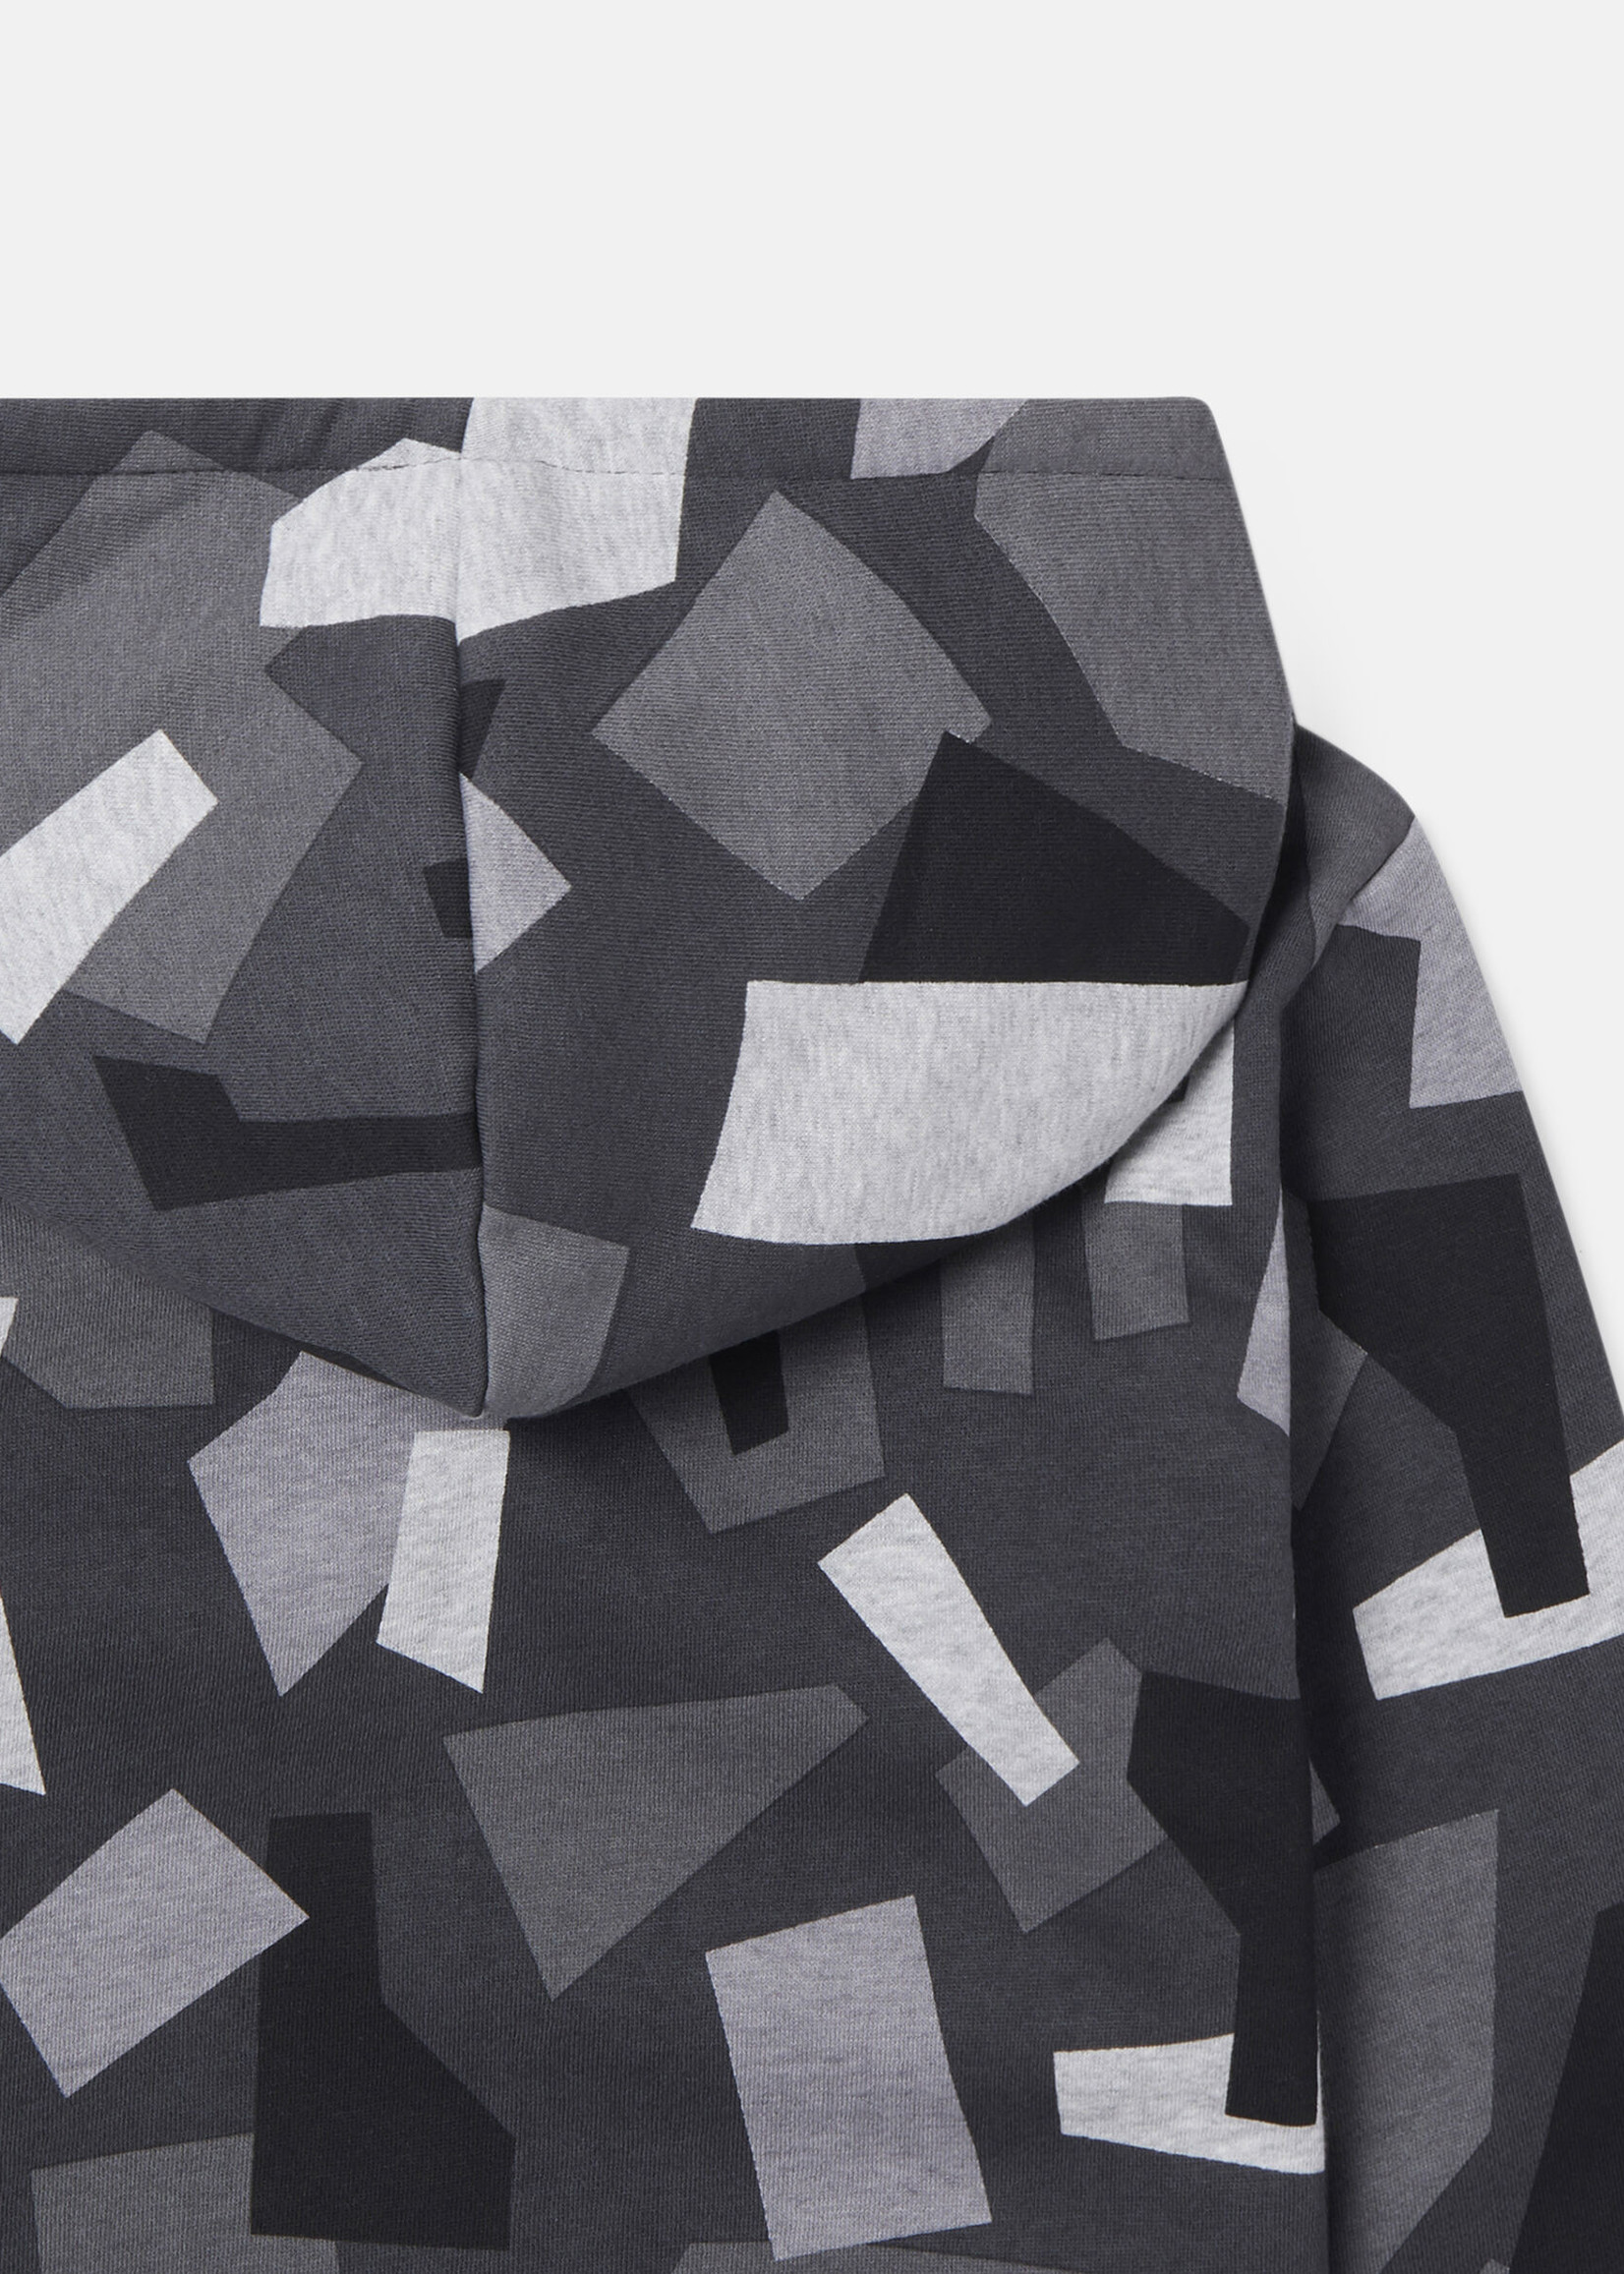 Stella McCartney Stella McCartney-AW21 603269 geometric camouflage hoodie